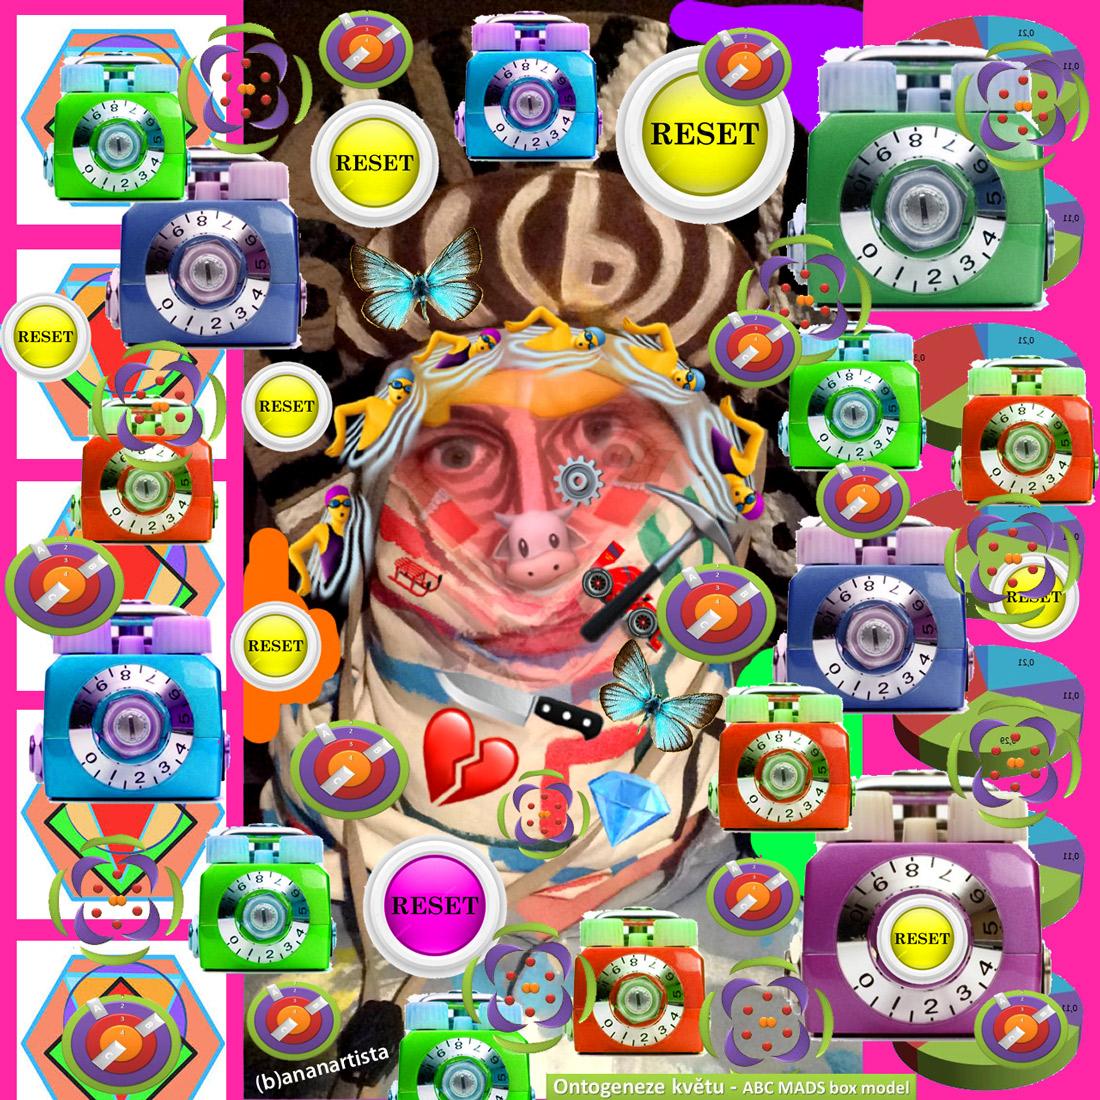 reset selfie: outsider digital art by (b)ananartista sbuff